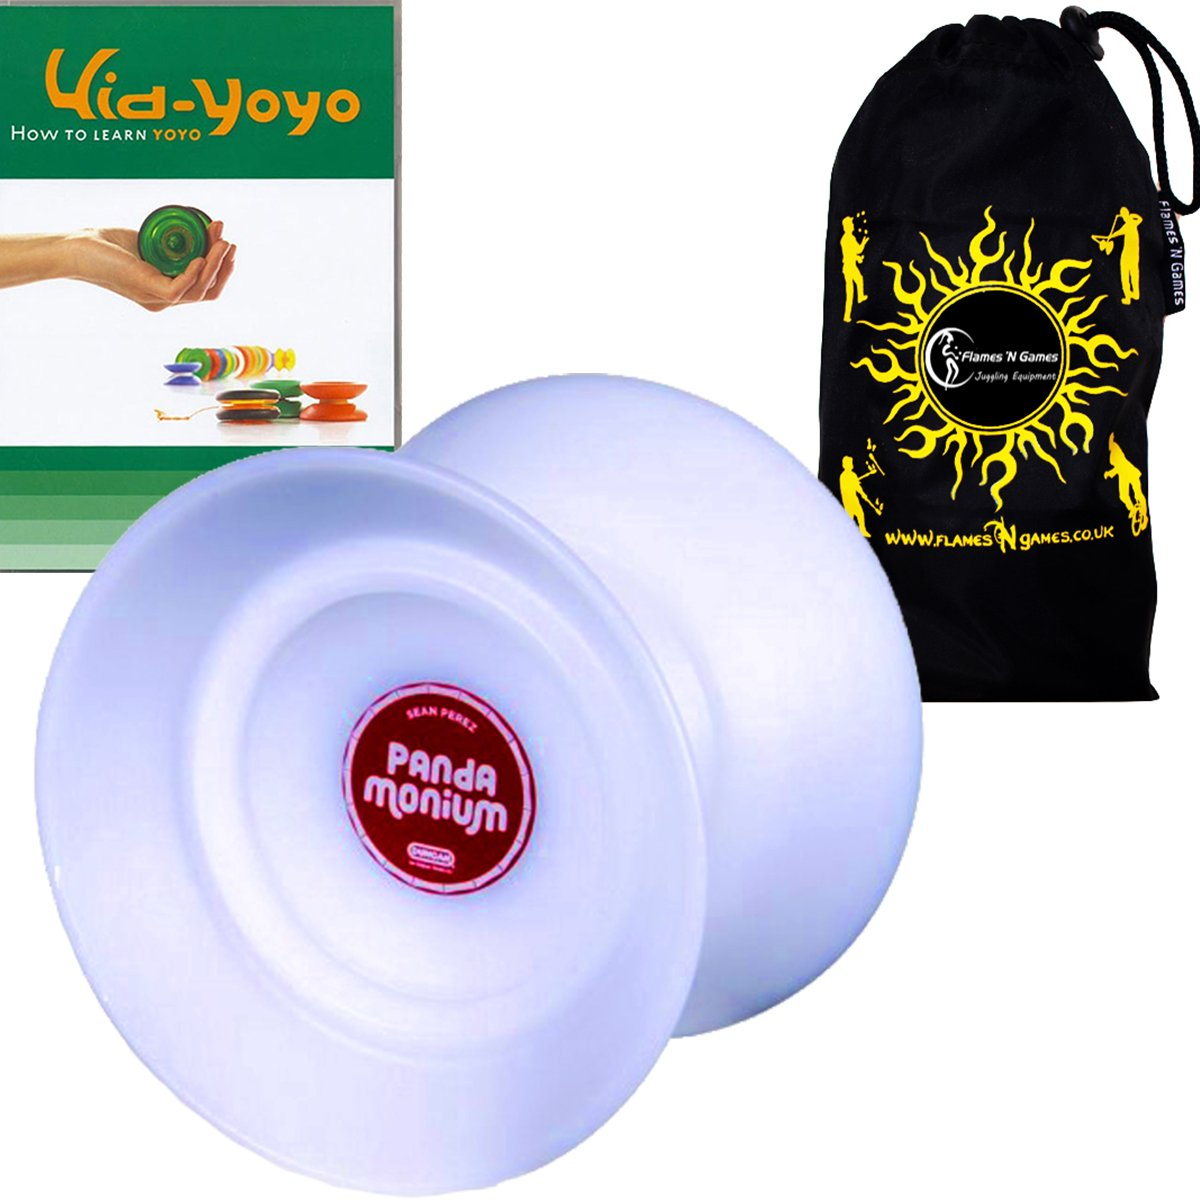 Duncan PANDAMONIUM Jumbo Butterfly Shape Offstring Yoyo - Supreme Quality Large Yo Yo For 4A Tricks + Kid YoYo DVD + Travel Bag! Ideal Yo-Yo for Competitions All Ages